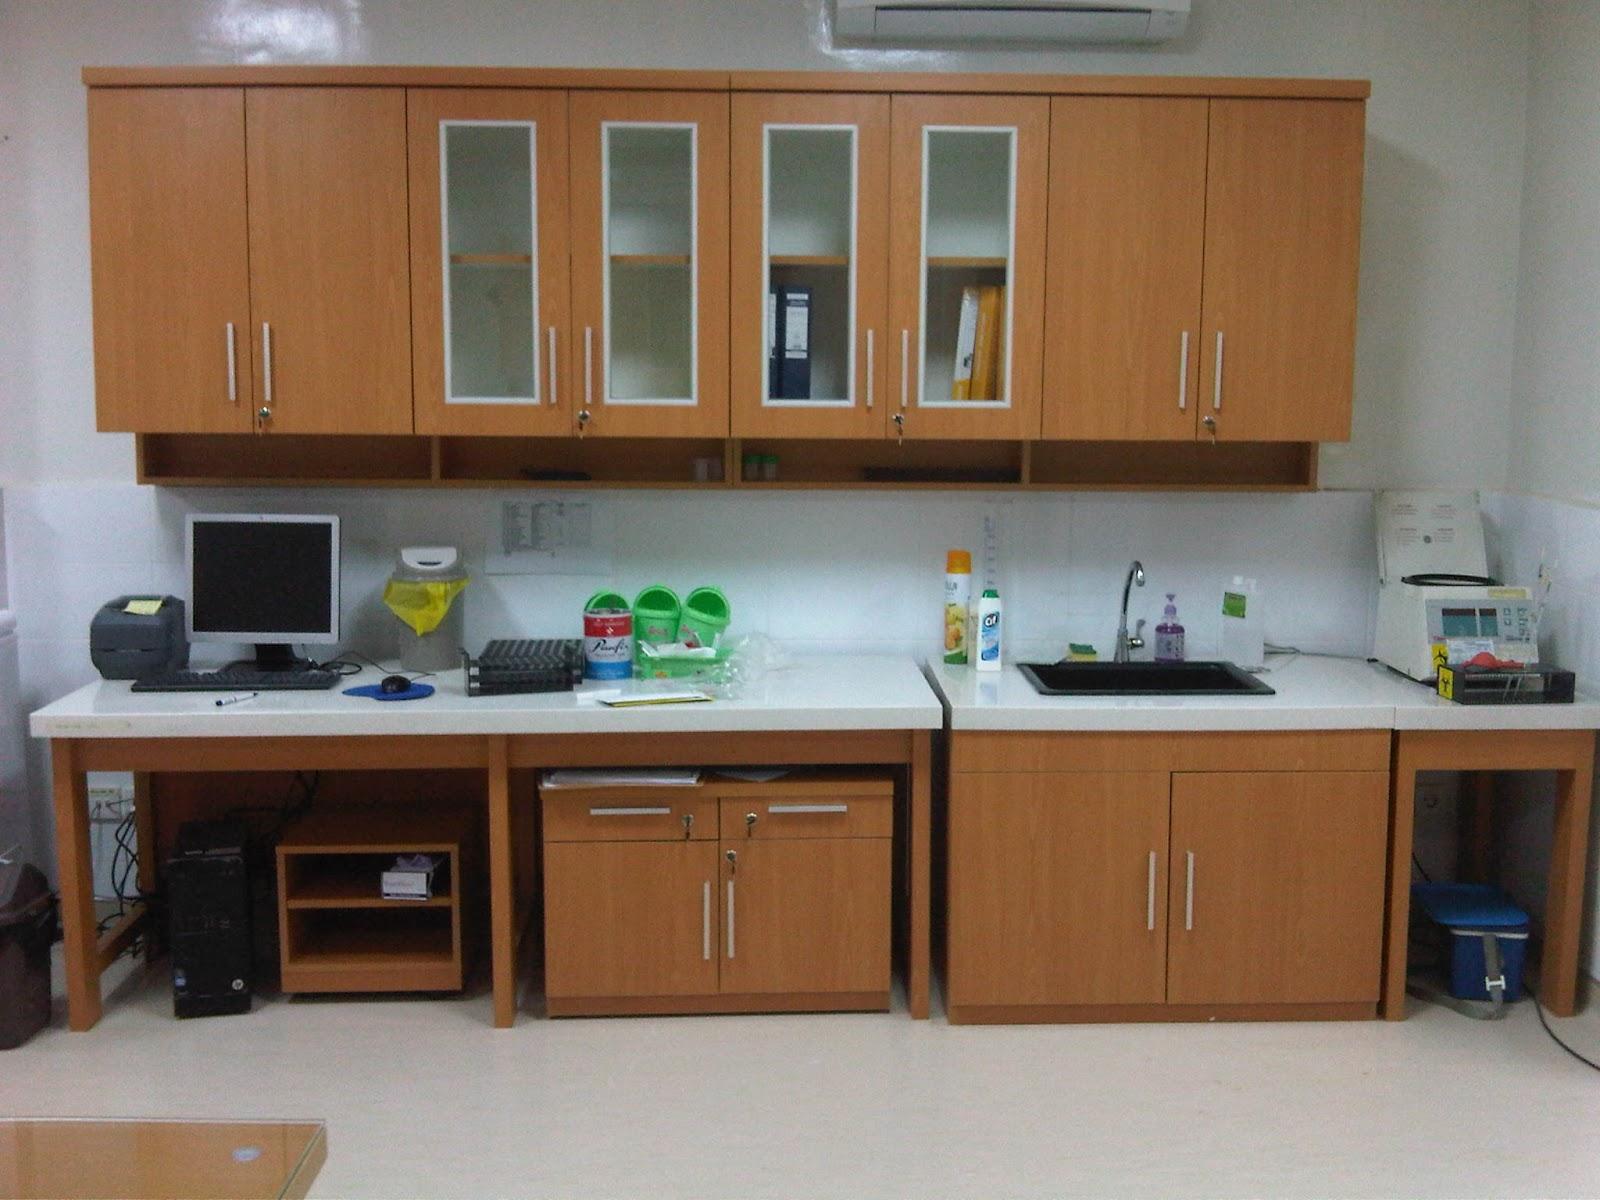 gambar rancangan dapur 2014 terbaru desain rumah share